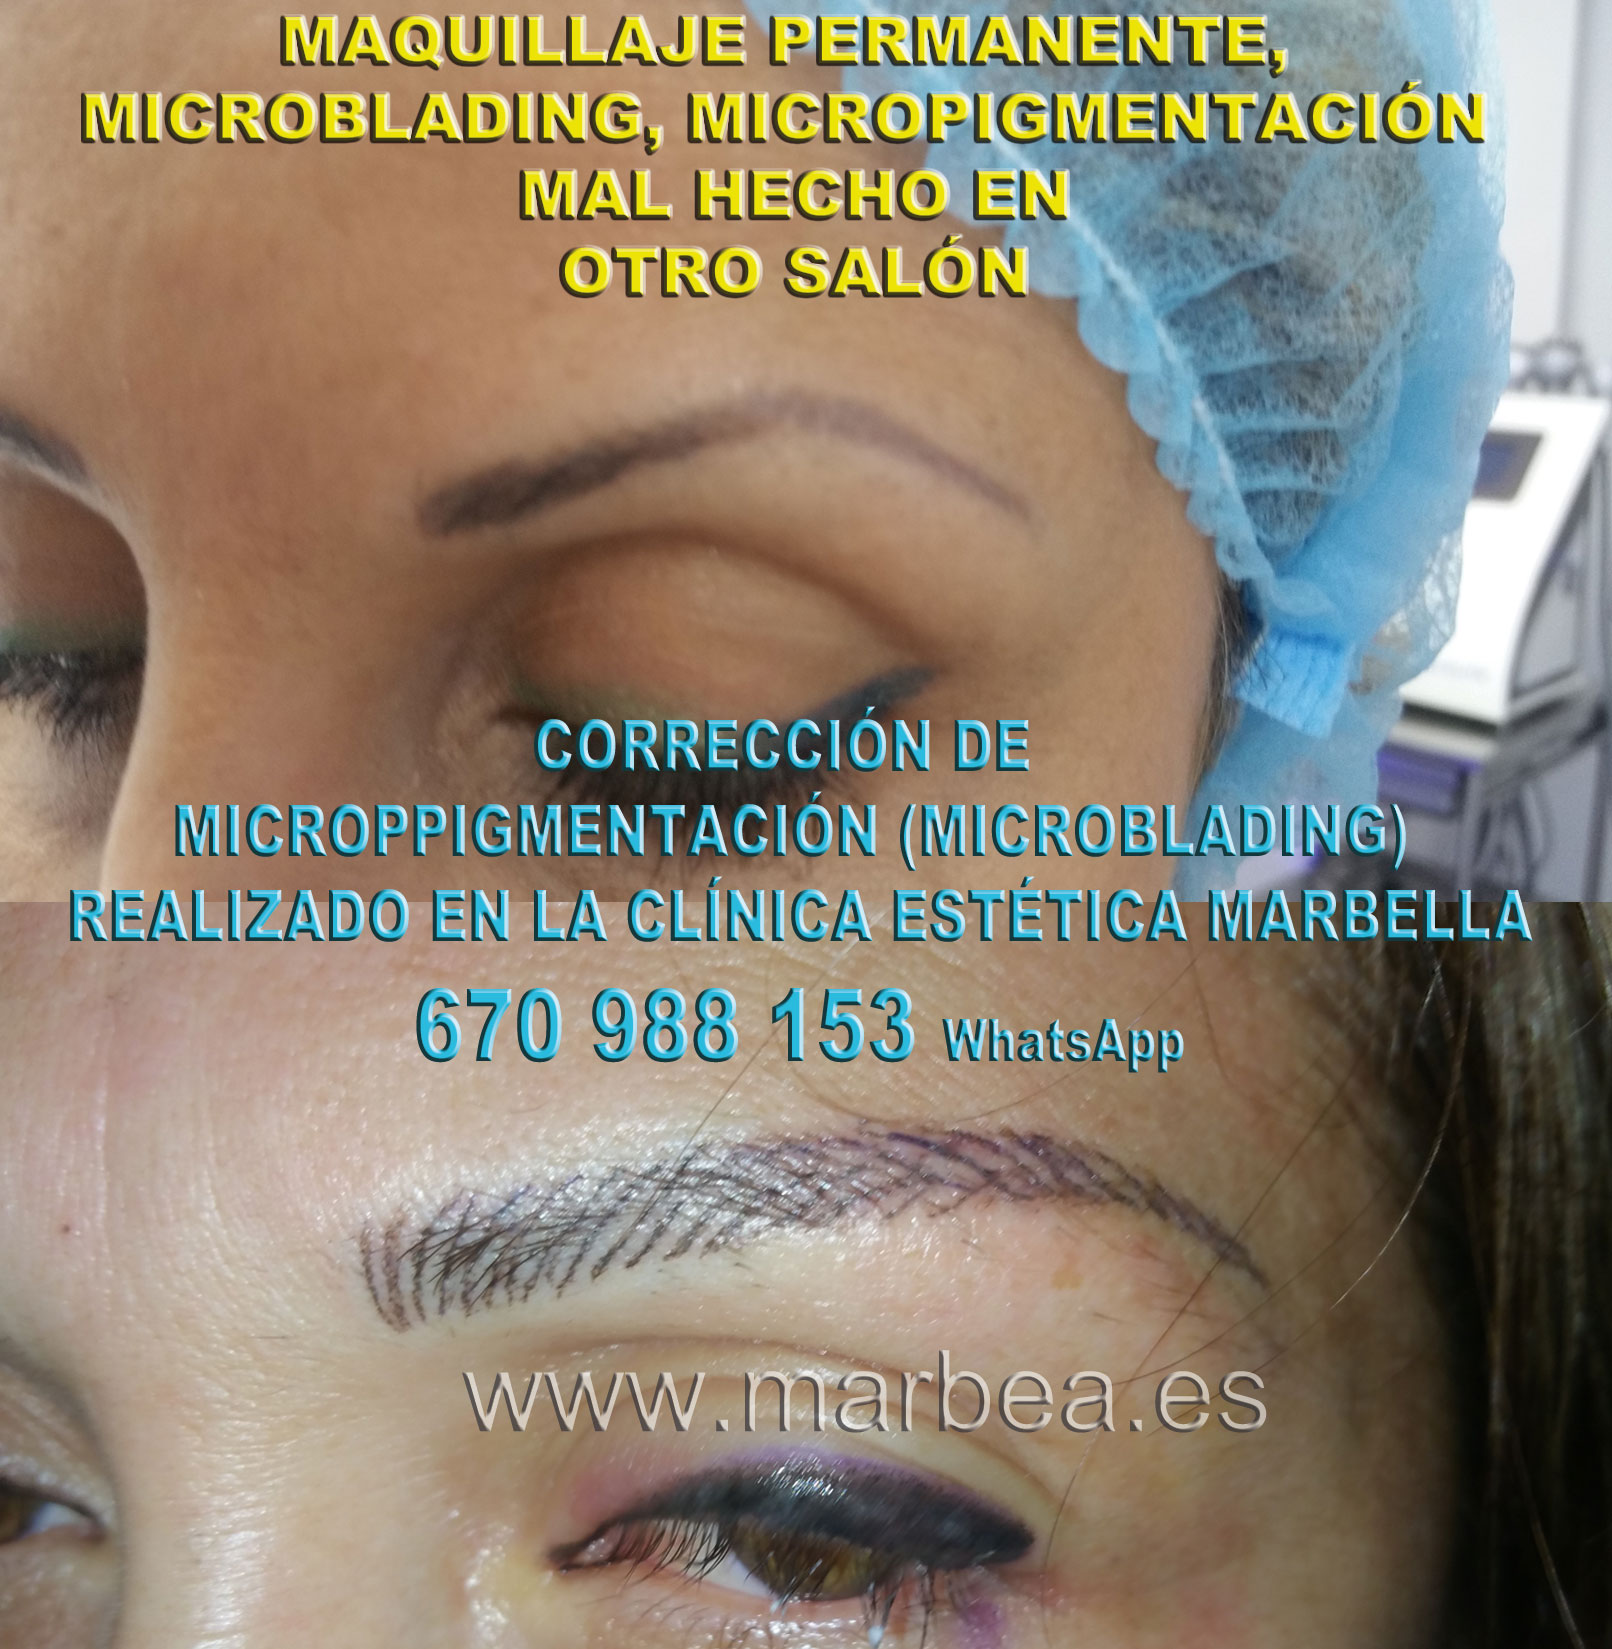 Borrar maquillaje permanente mal hecha clínica estética micropigmentación entrega eliminar la micropigmentación de cejas,reparamos microppigmentacion mal hechos